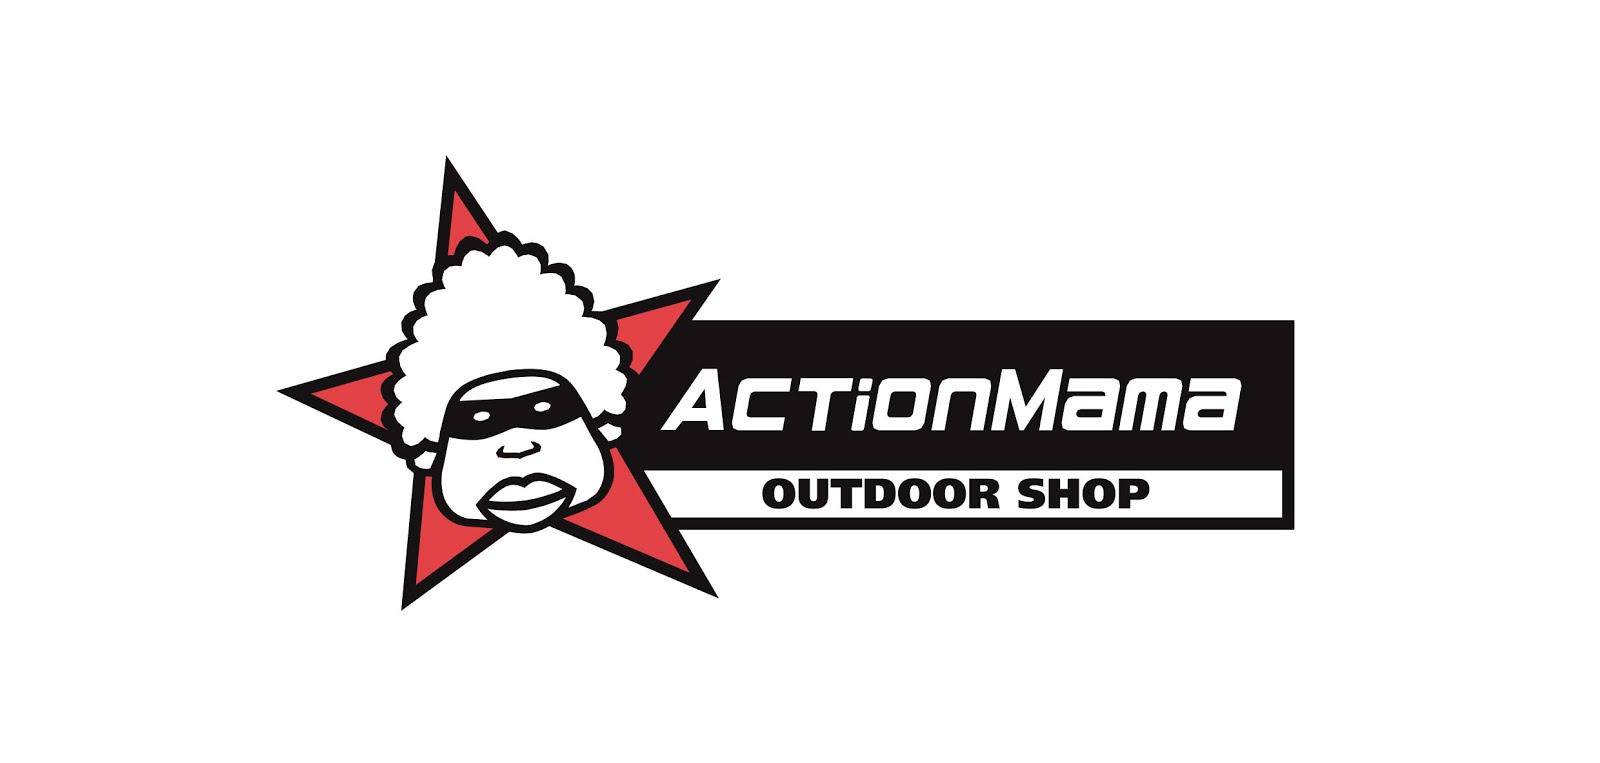 Actionmama.com